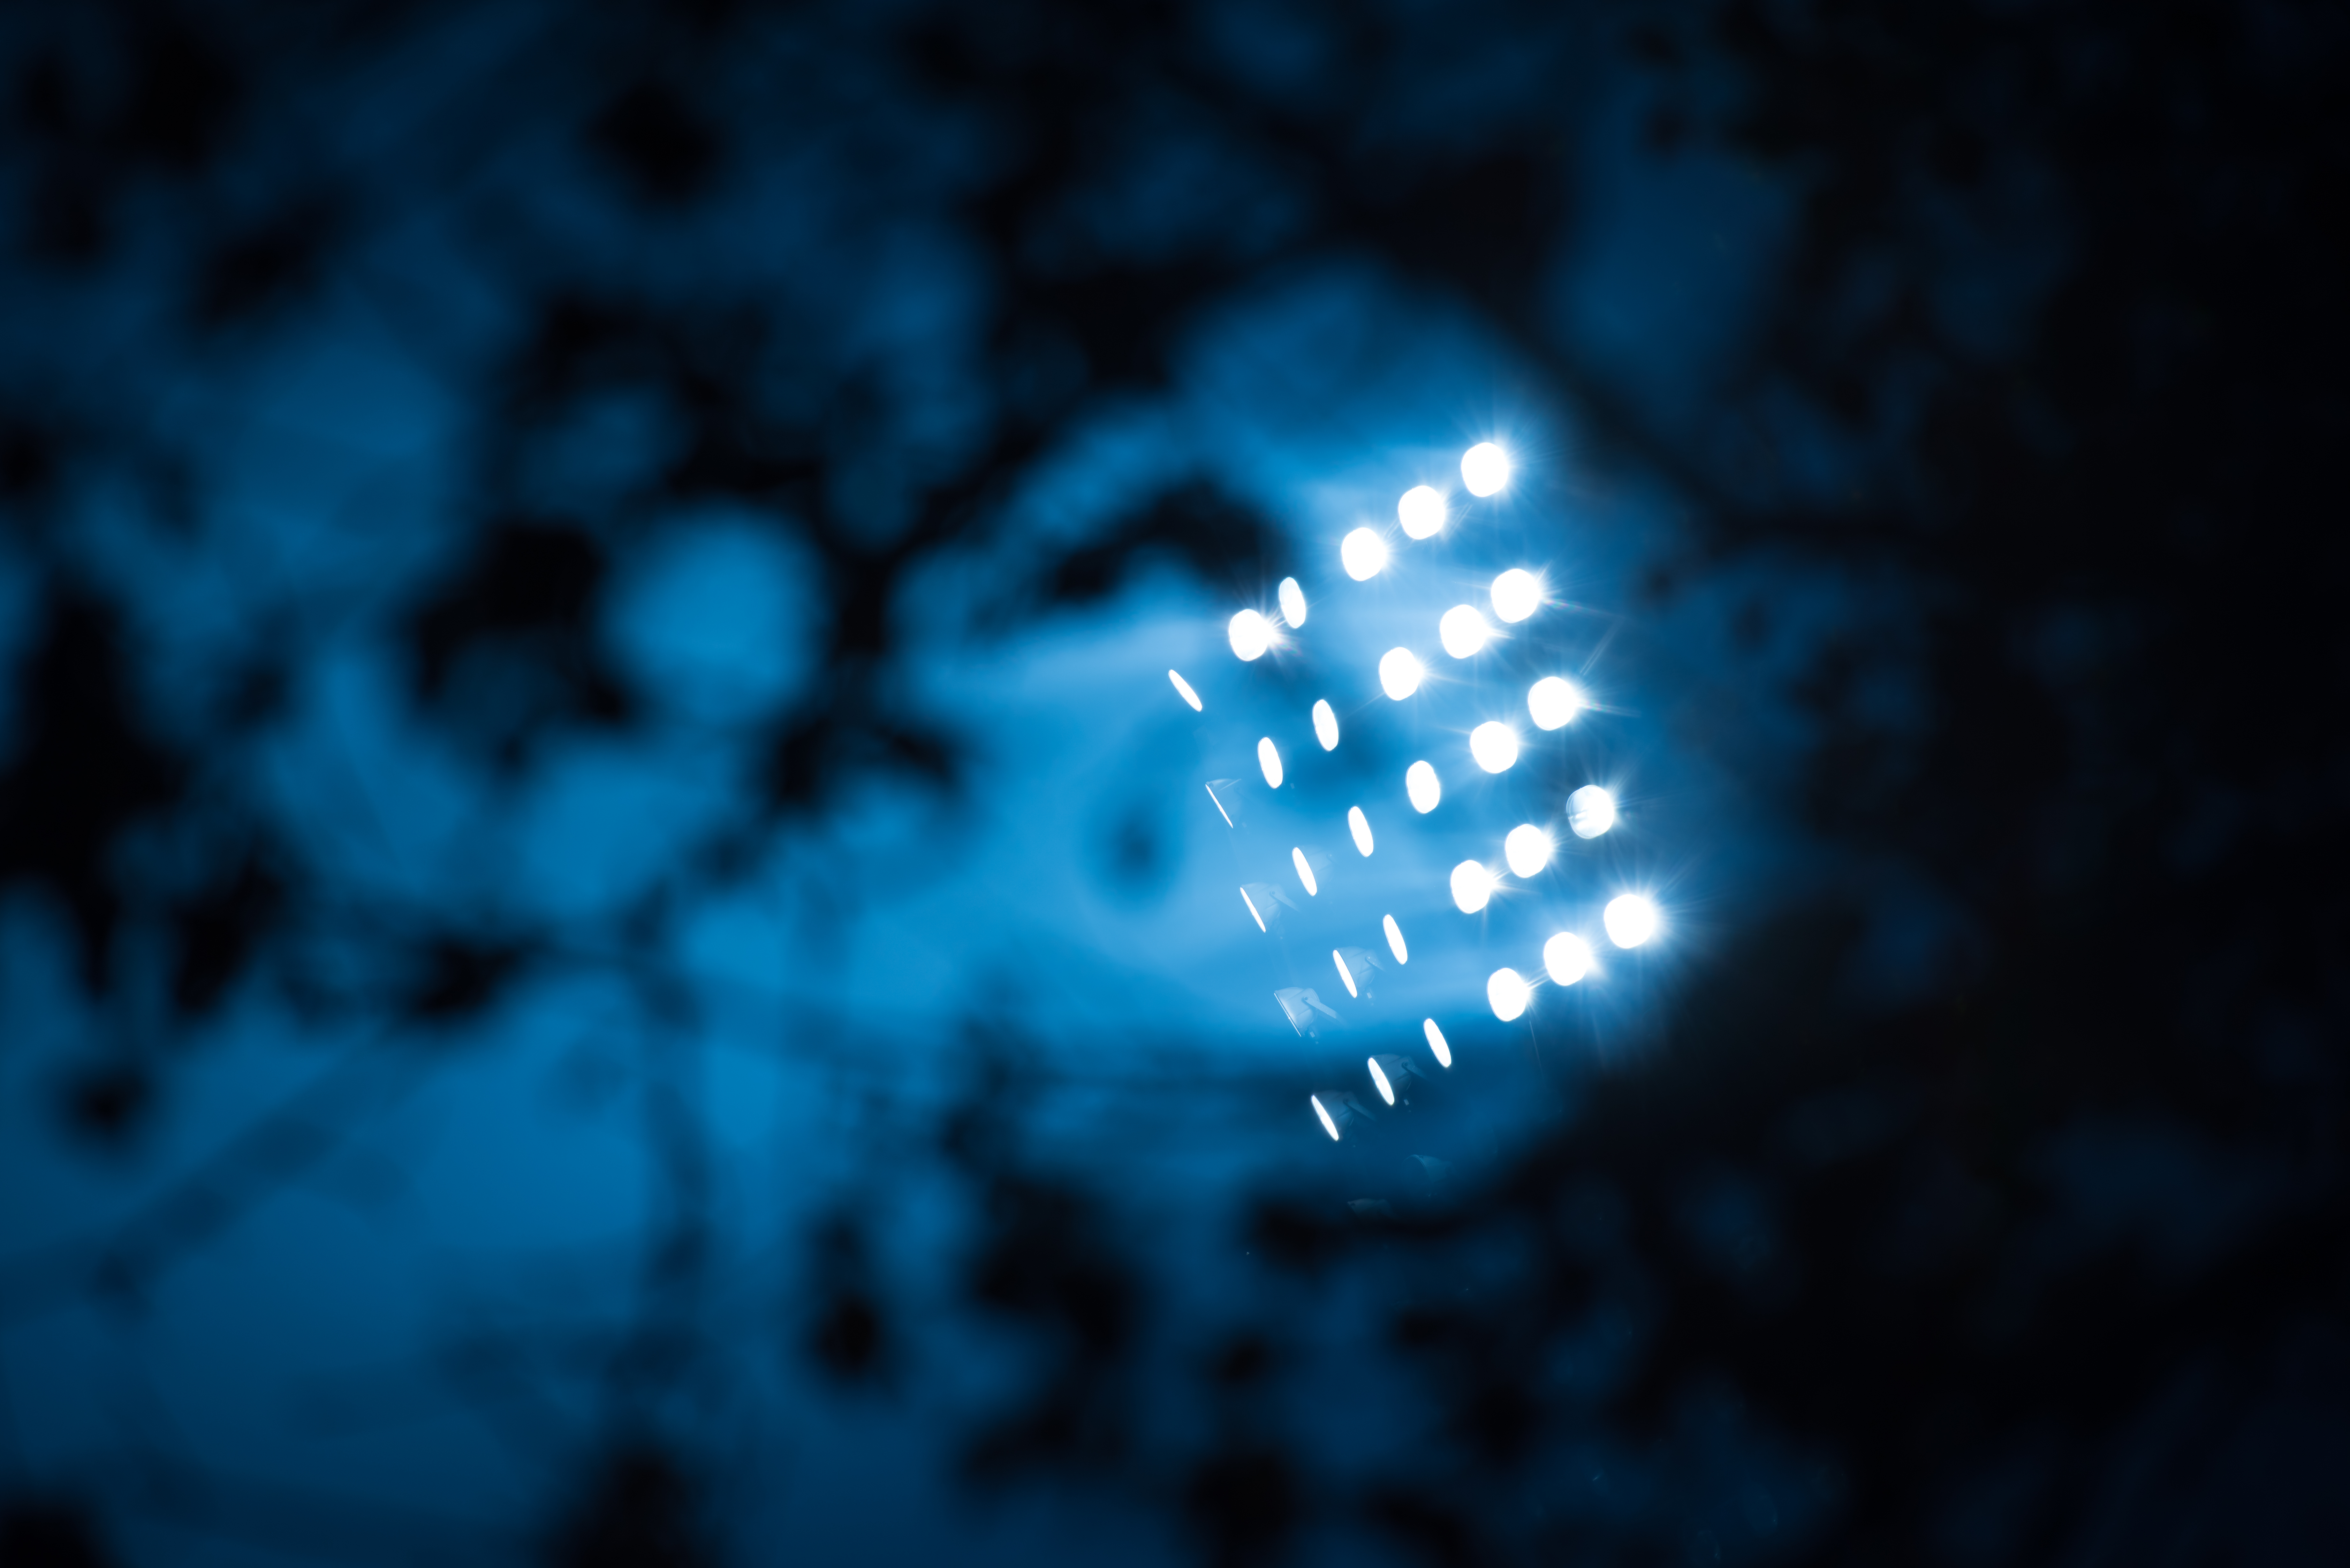 Storyblocks Soccer Stadium Lights Reflectors Against Black Background Sowm77 Igh